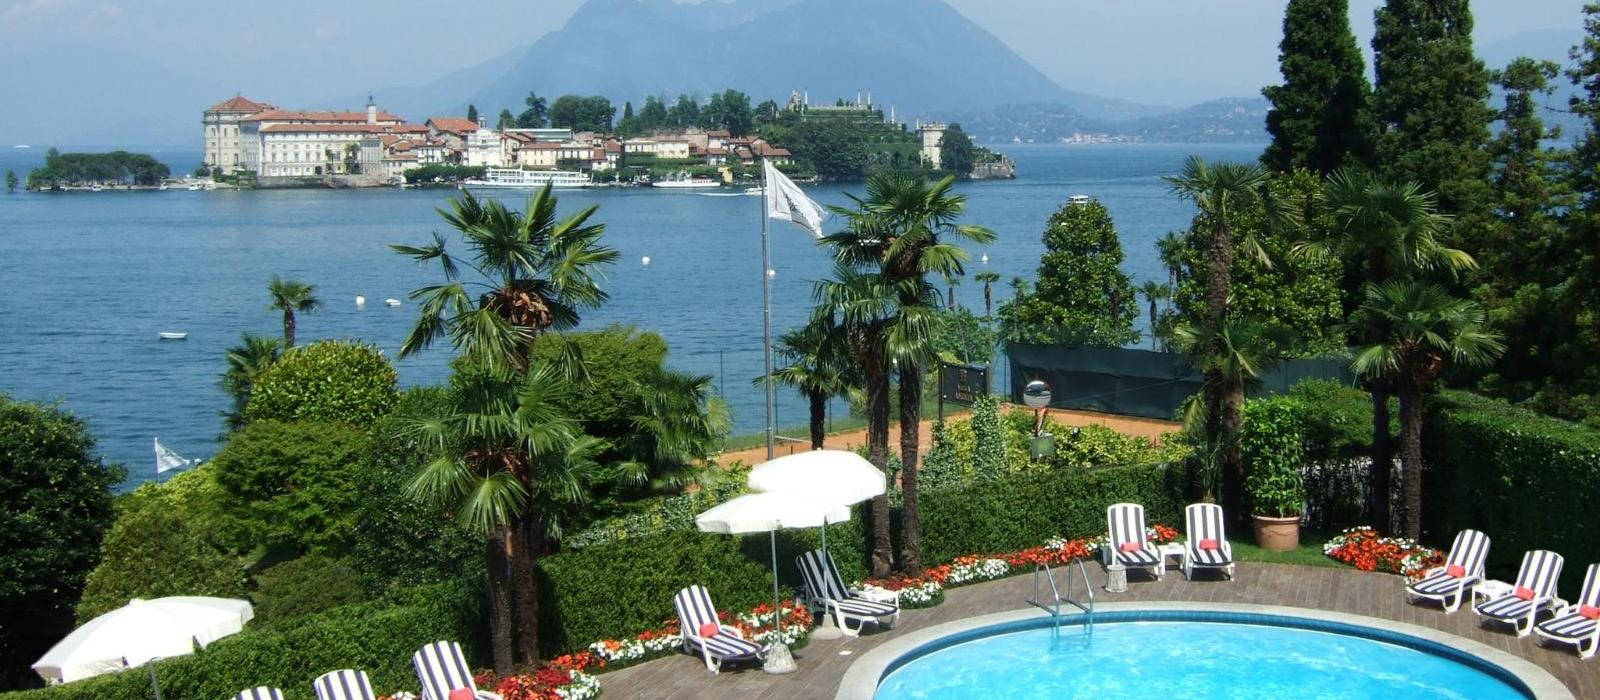 阿明塔皇宫别墅酒店(Villa & Palazzo Aminta Beauty & SPA) 图片  www.lhw.cn